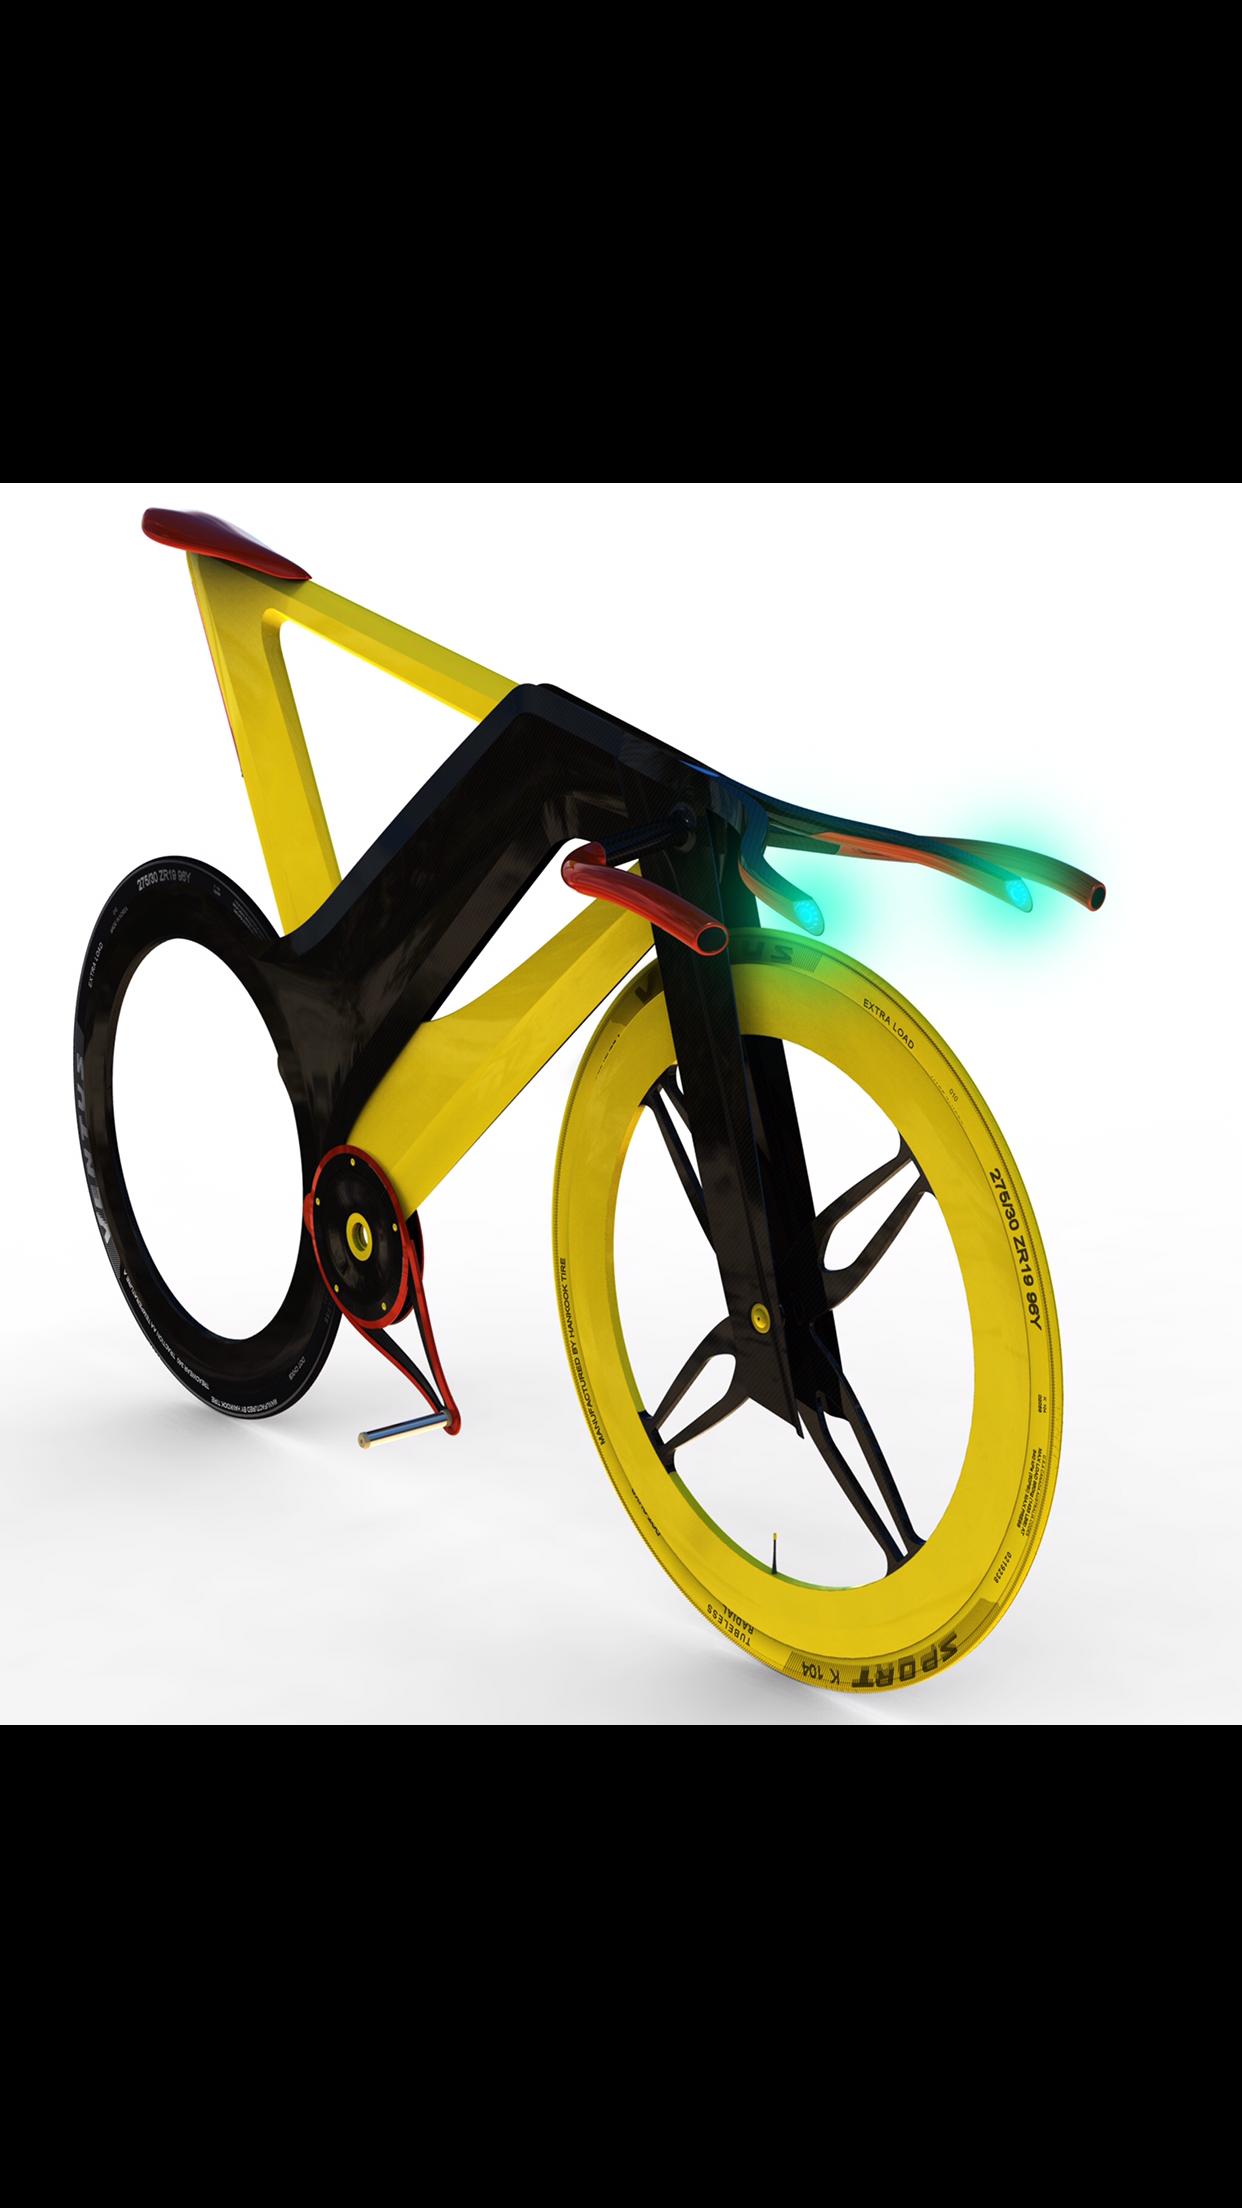 The Mooby Bike Https Fb Com Kul Stoff Fahrrad Stoffe